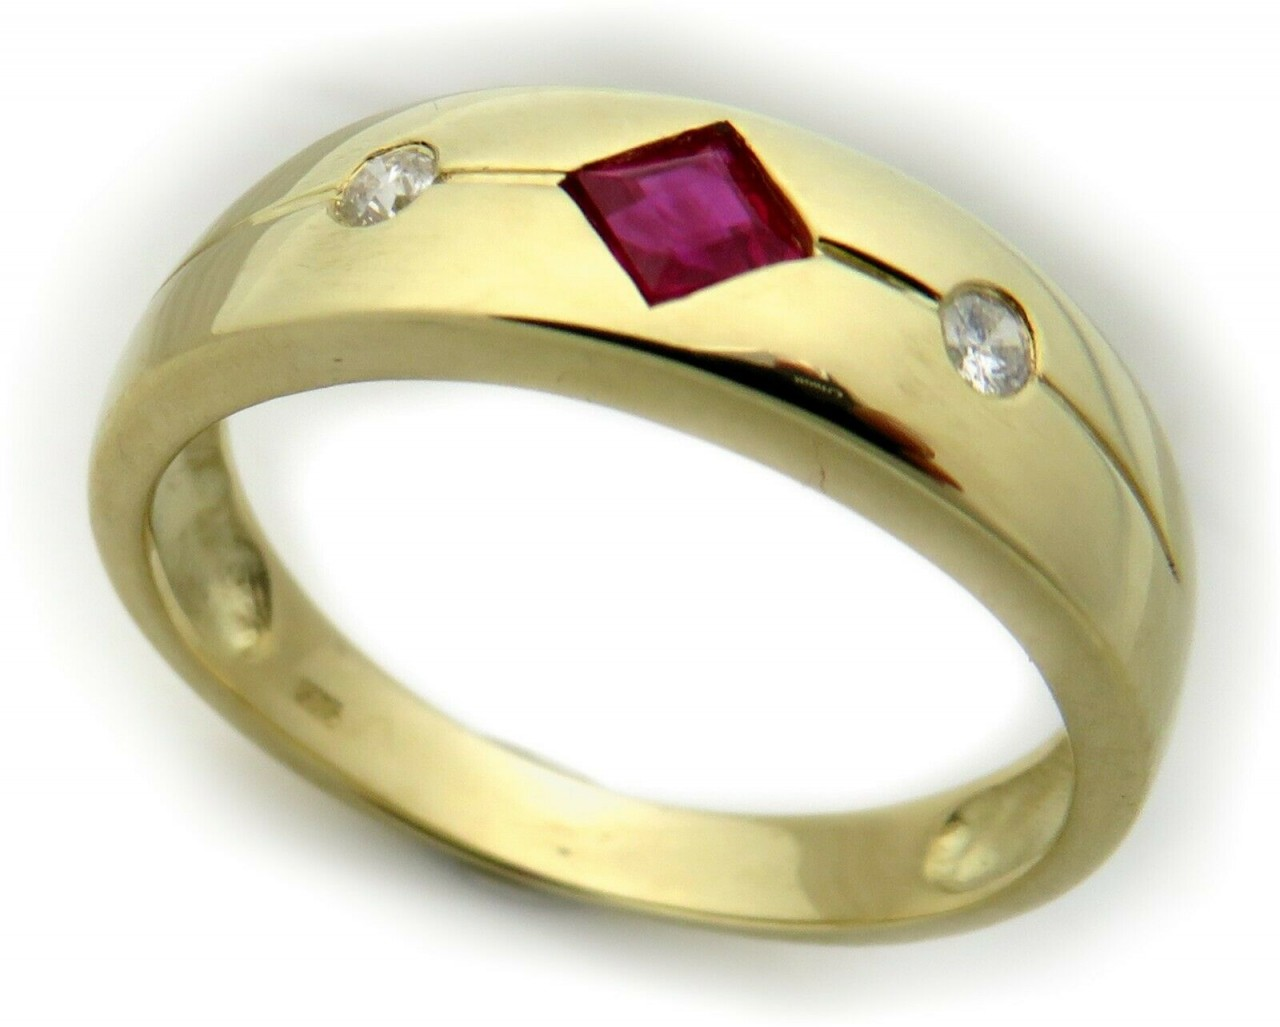 Damen Ring Rubin m. Diamant 0,04ct echt Gold 750 18 karat Gelbgold Brillant Neu